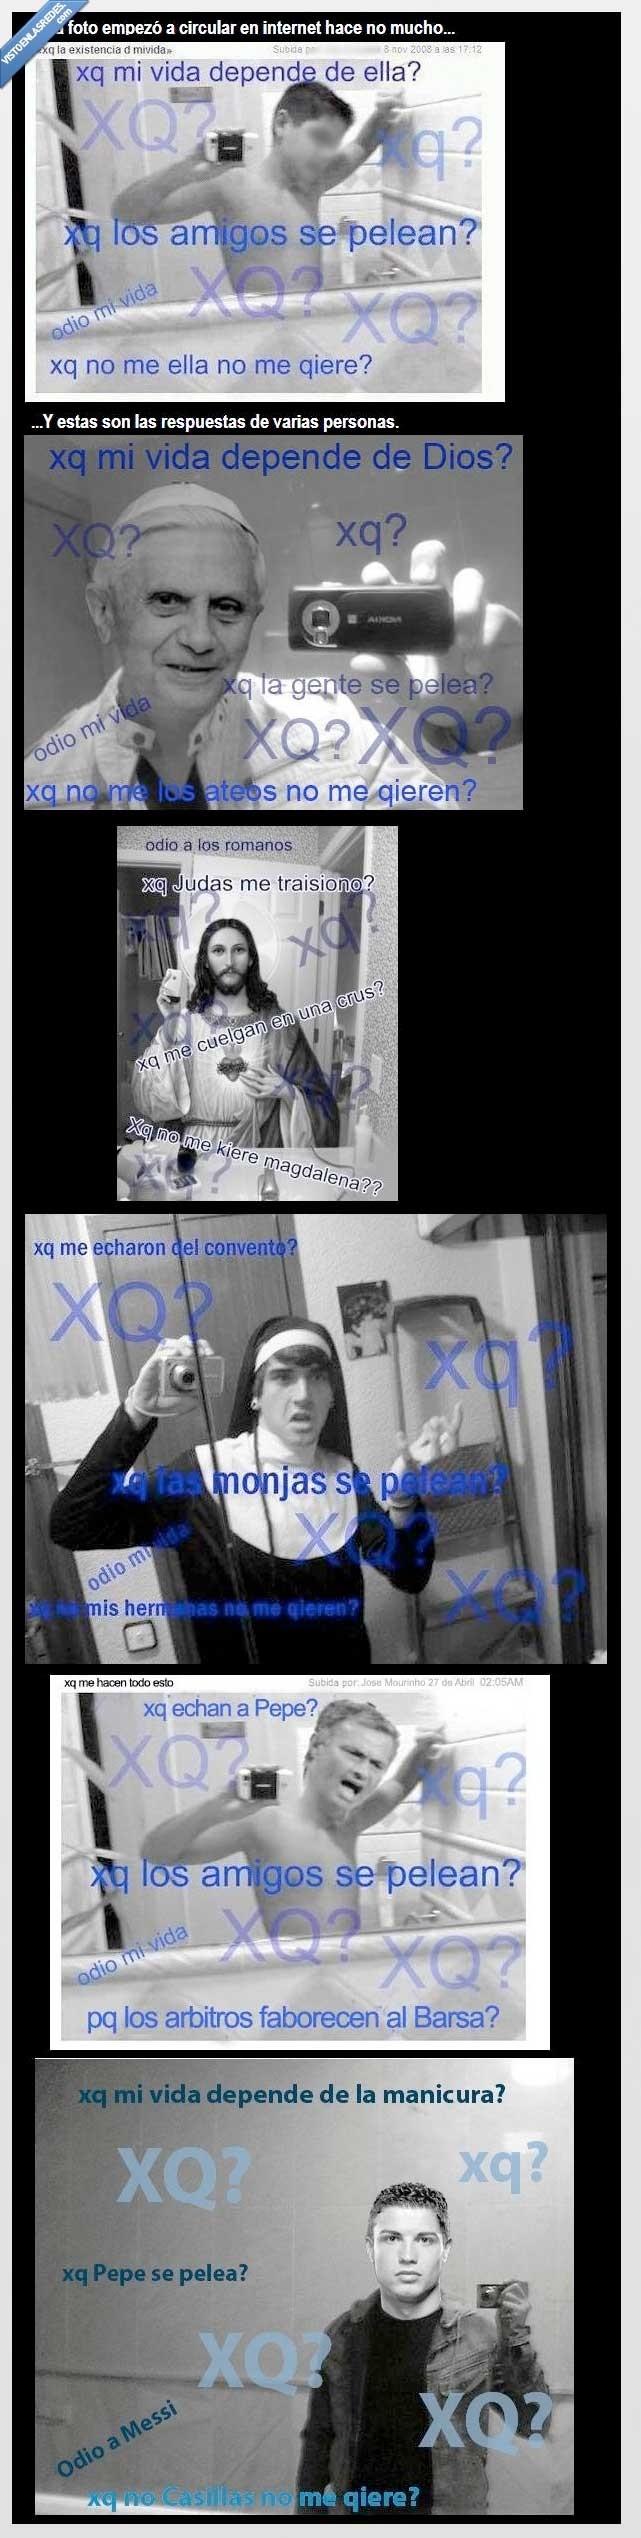 cristiano ronaldo,foto,jesus,monja,montaje,papa,vida,xq?